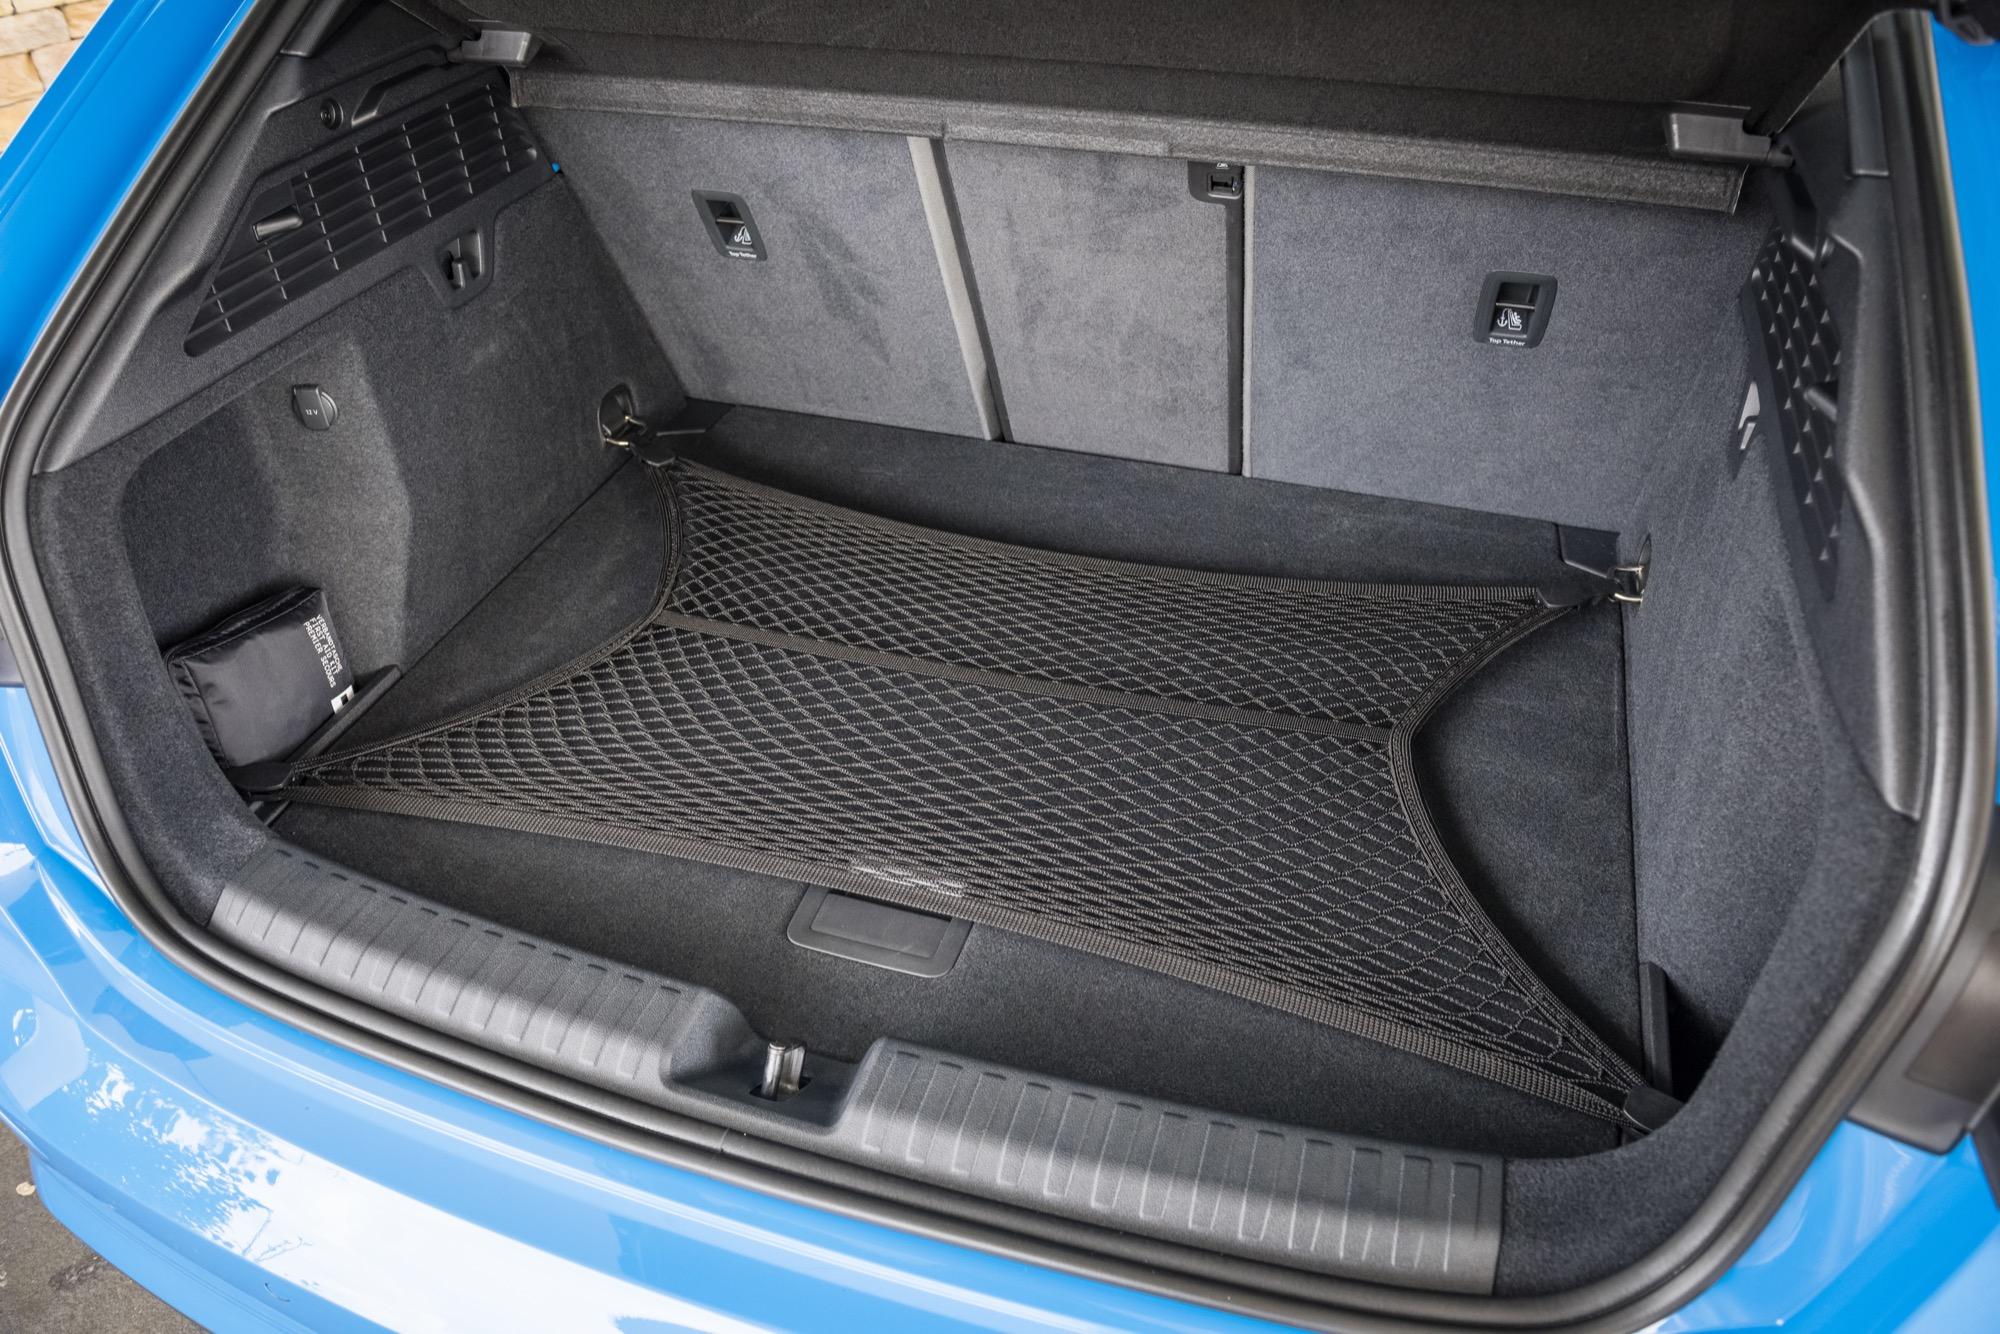 Audi_A3_Sportback_30_TDI_lowres_55